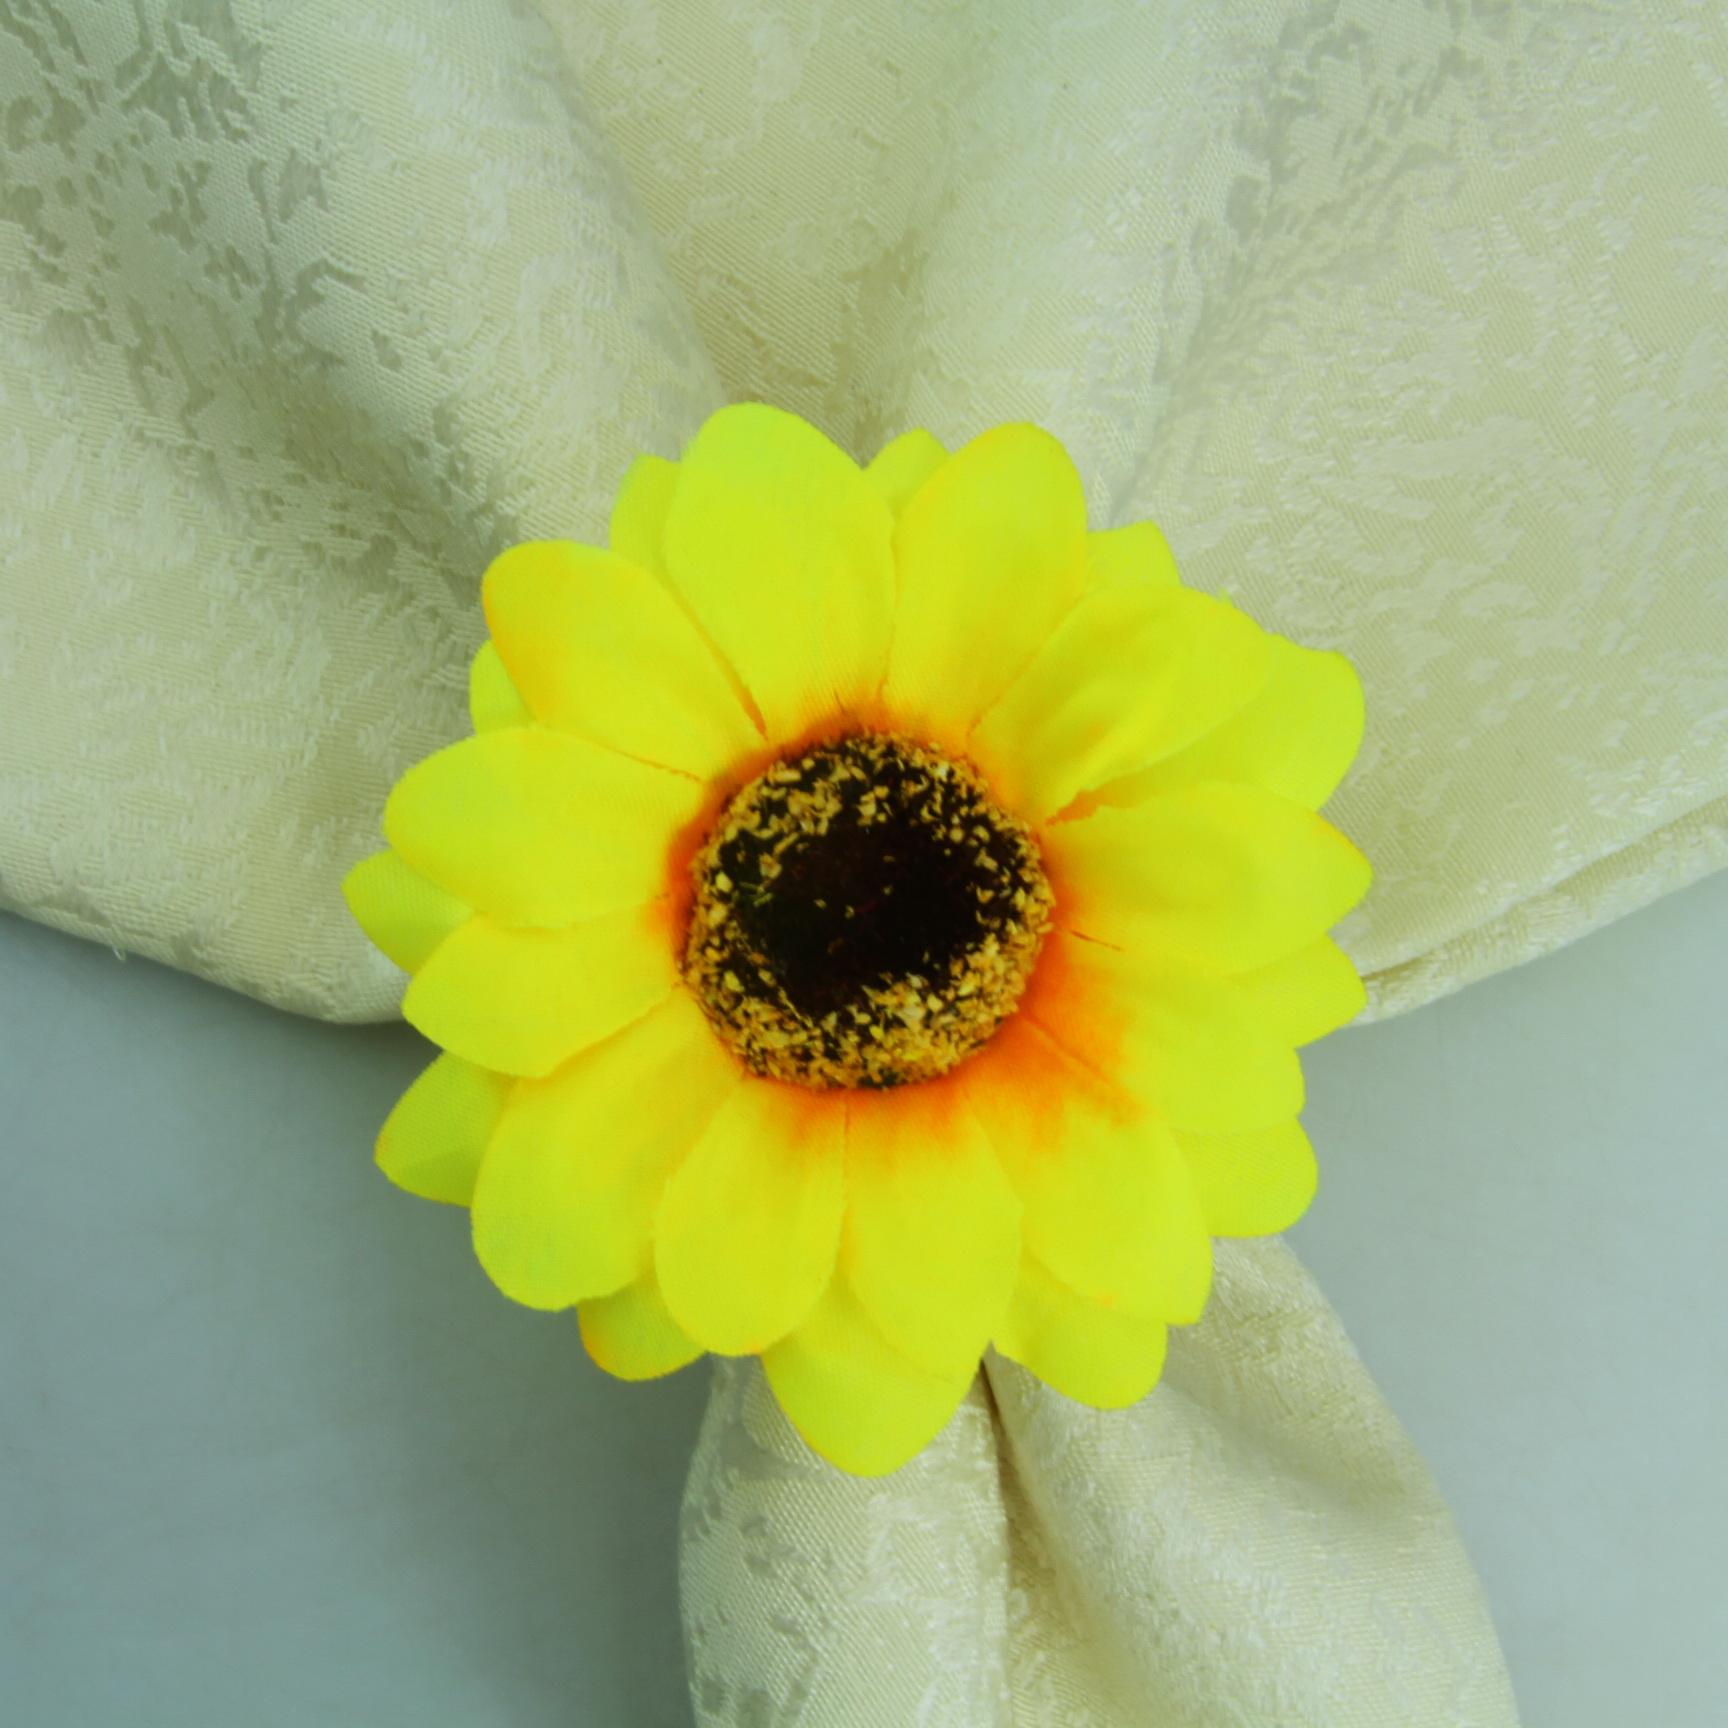 Silk Sunflower Napkin Ring Wedding Napkin Holder Buy Silk Flower Napkin Ring Favor Wedding Ring Holder Make Decorative Napkin Rings Product On Alibaba Com